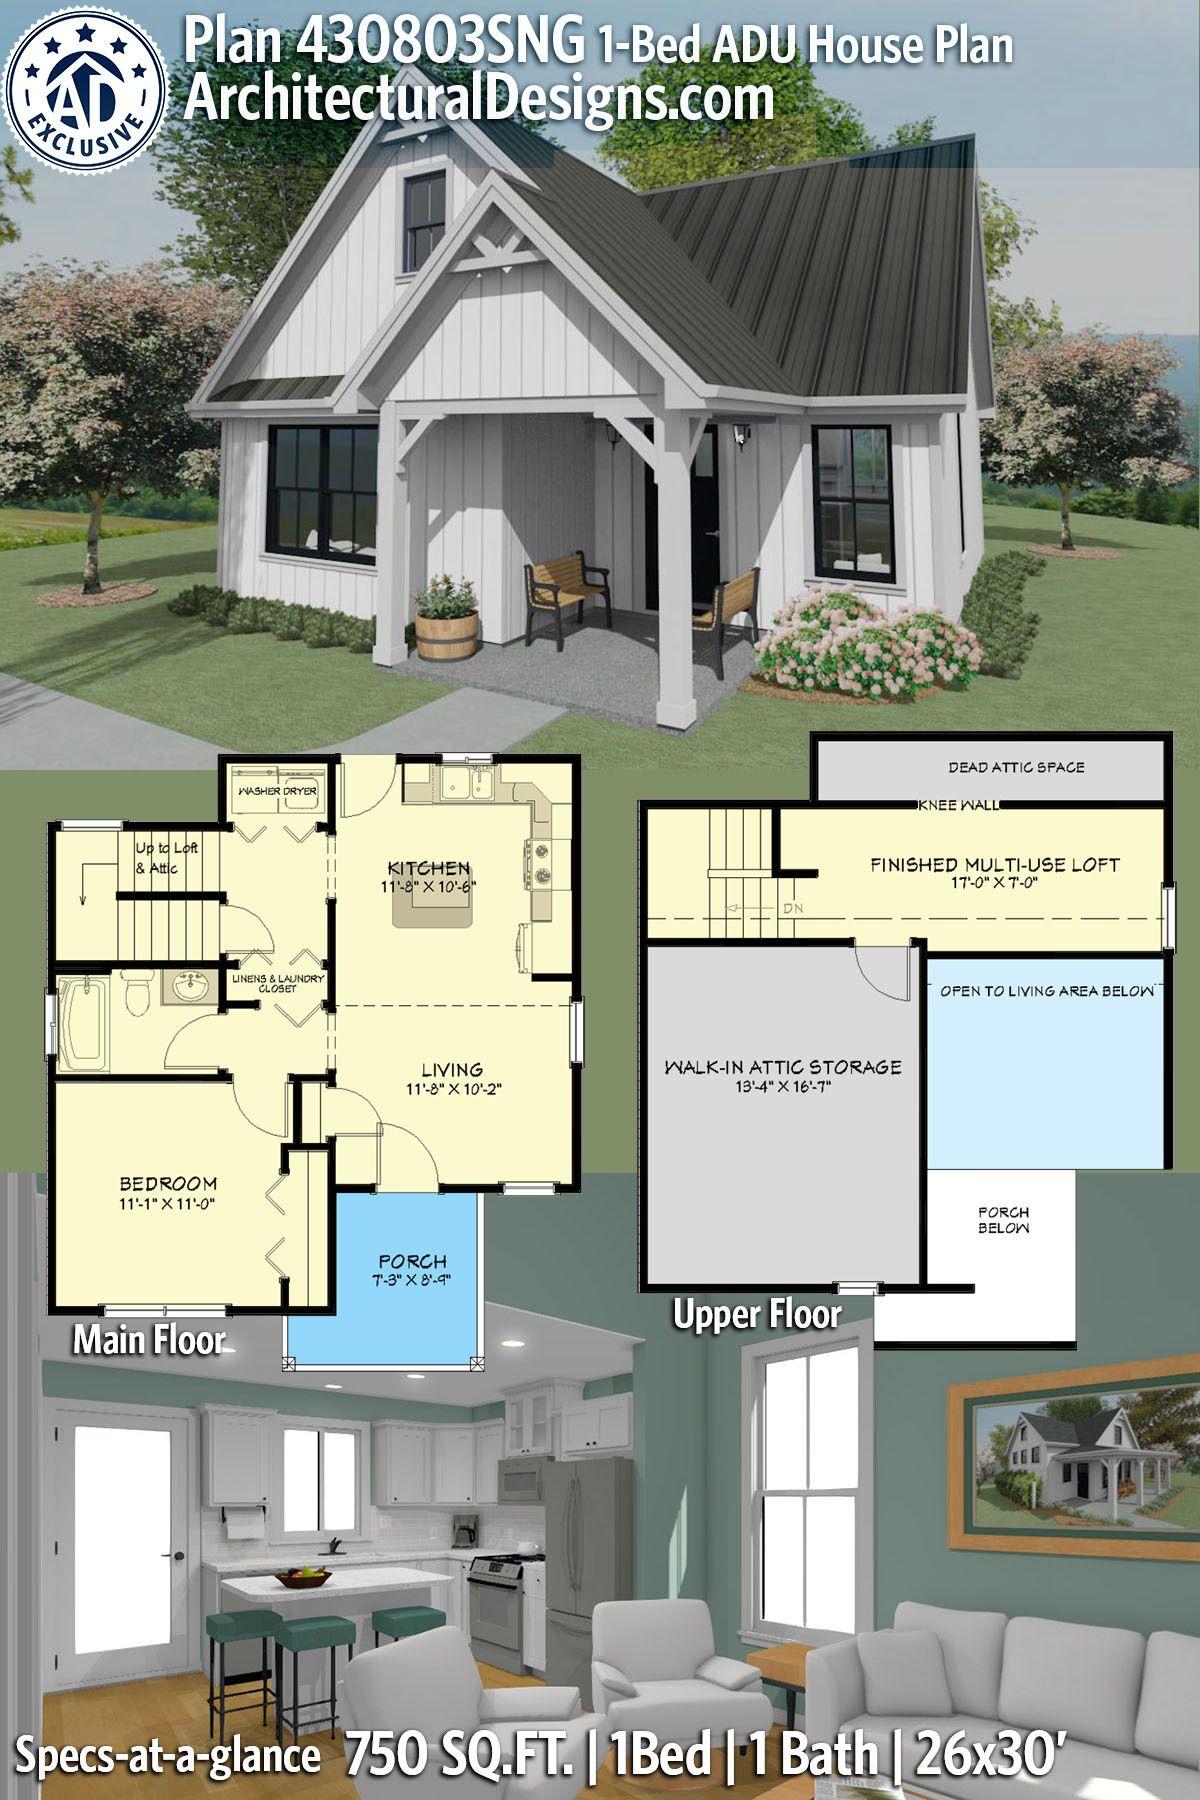 Plan 430803sng Exclusive Adu Home Plan With Multi Use Loft Guest House Plans Building Plans House Cottage Plan